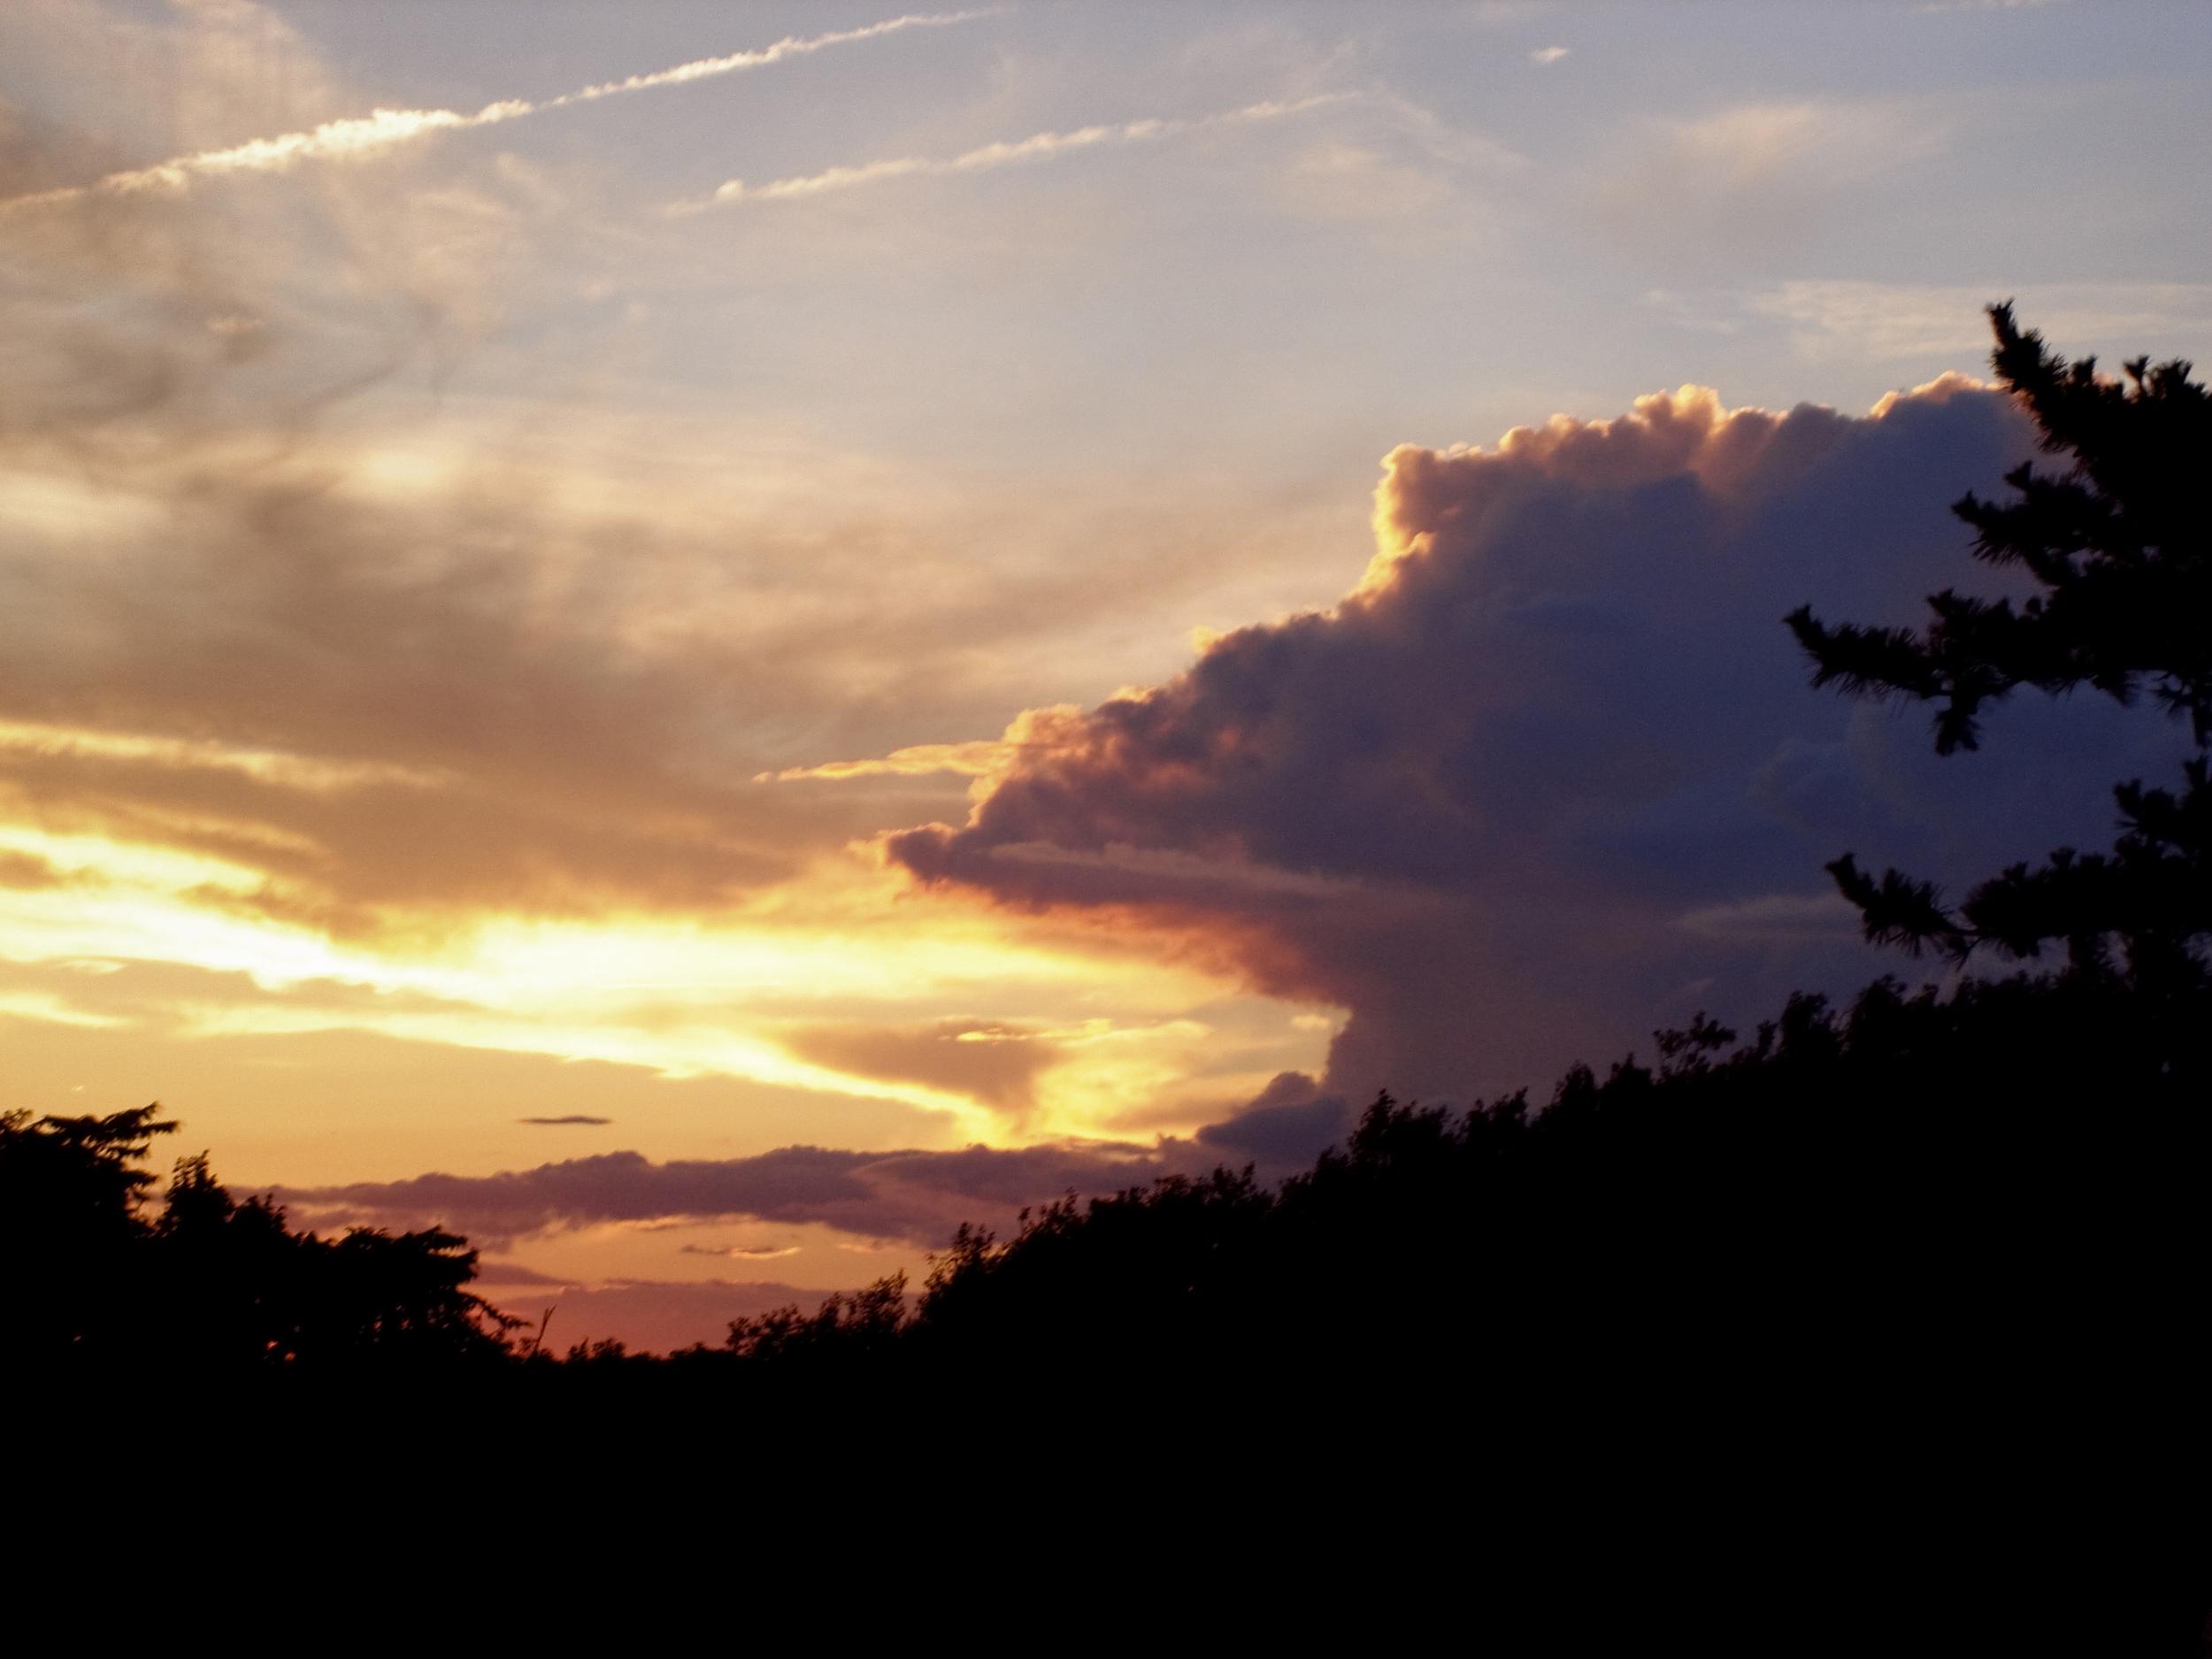 NE_SunsetSkyline_011.jpg